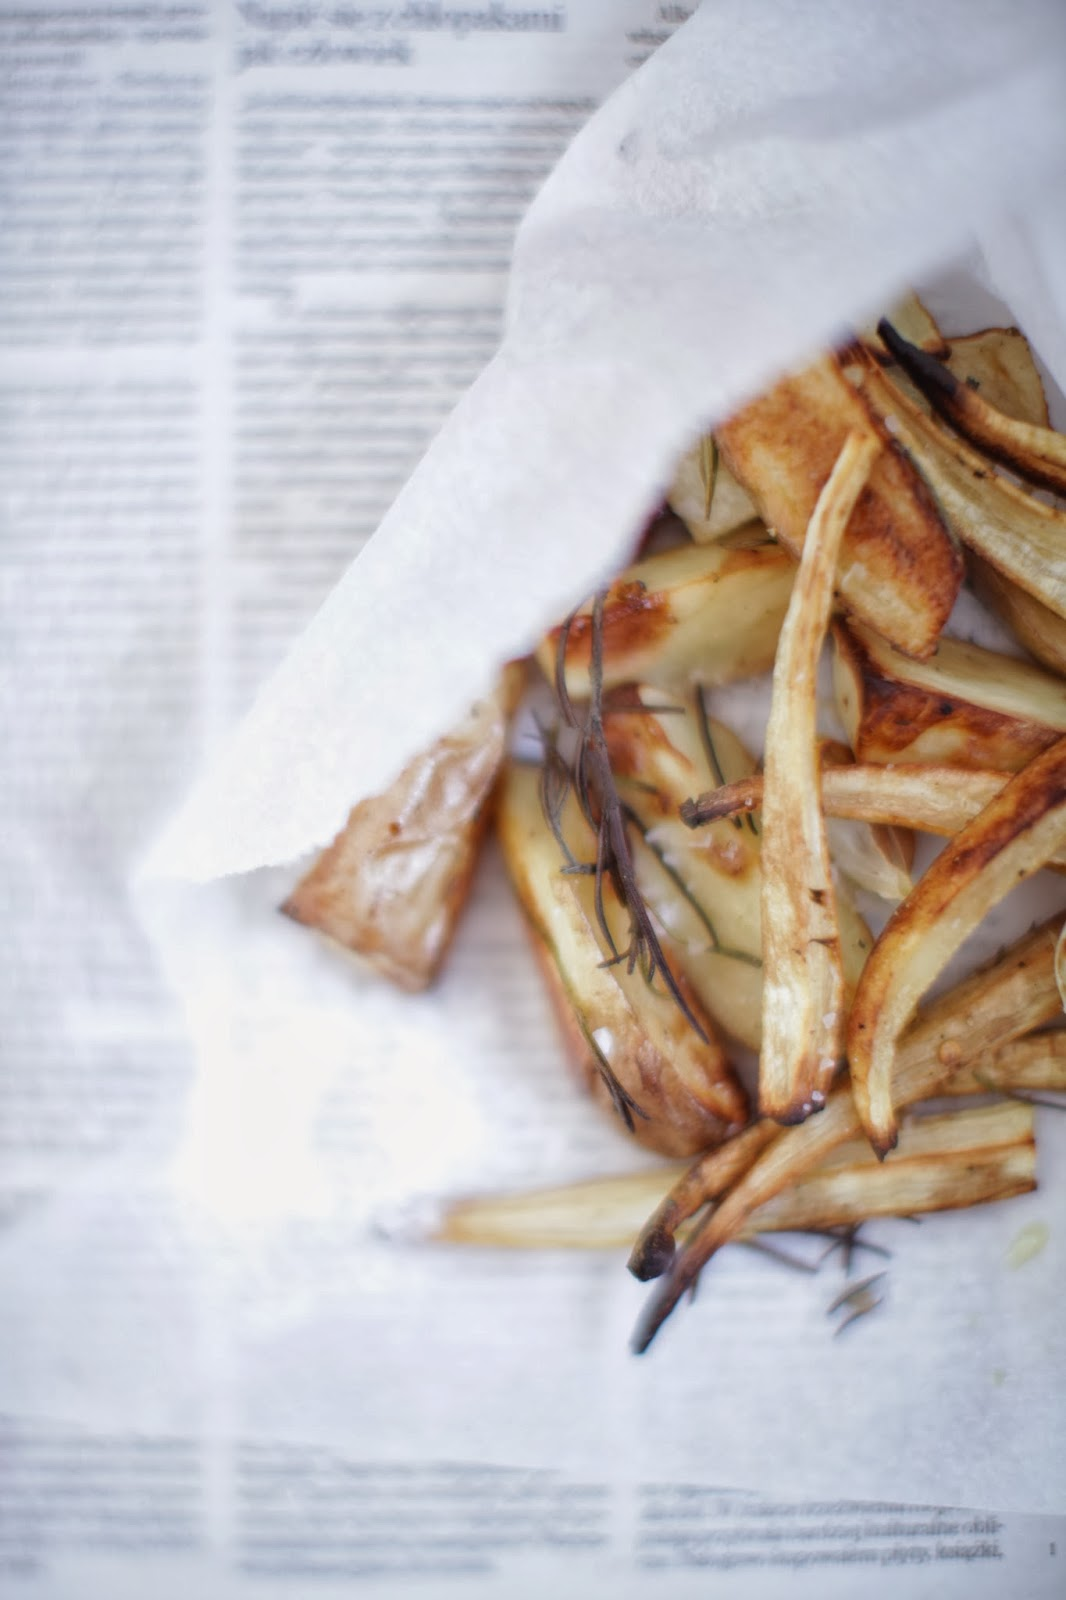 http://our-favorite-apple-pie.blogspot.com/2013/04/pieczone-warzywa.html